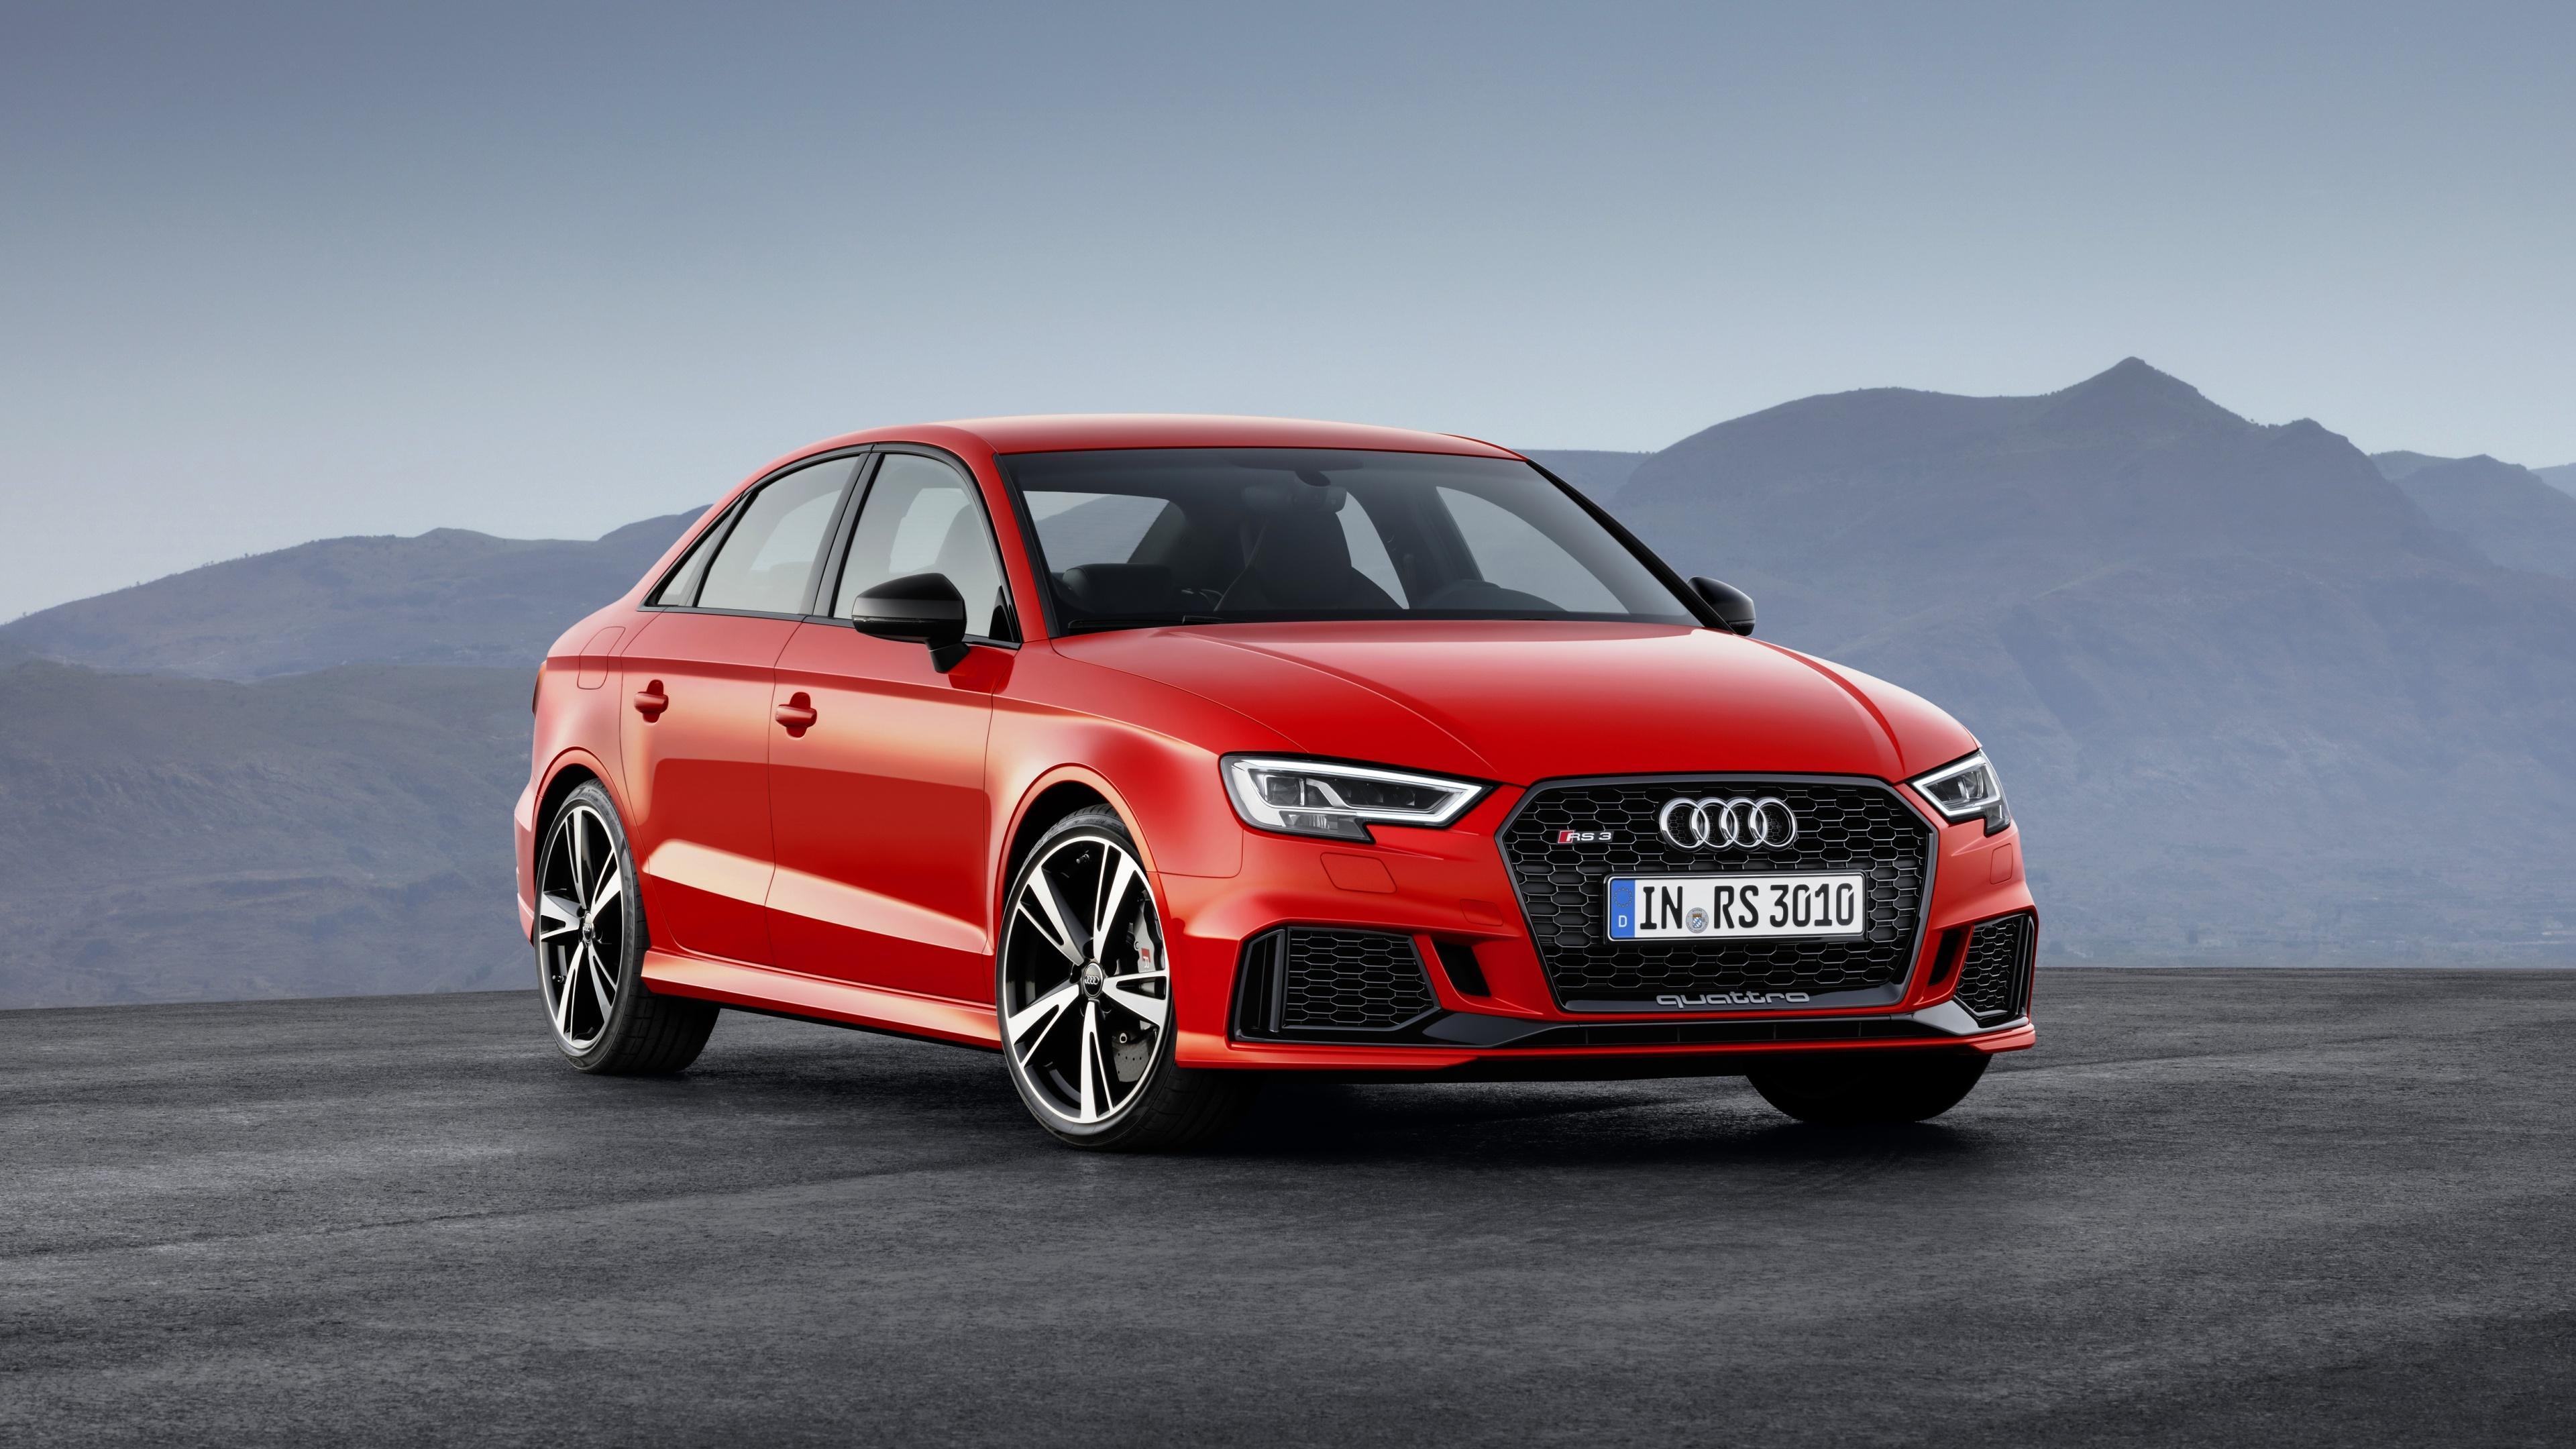 2018 Audi Rs3 Sedan Wallpaper Hd Car Wallpapers Id 7152